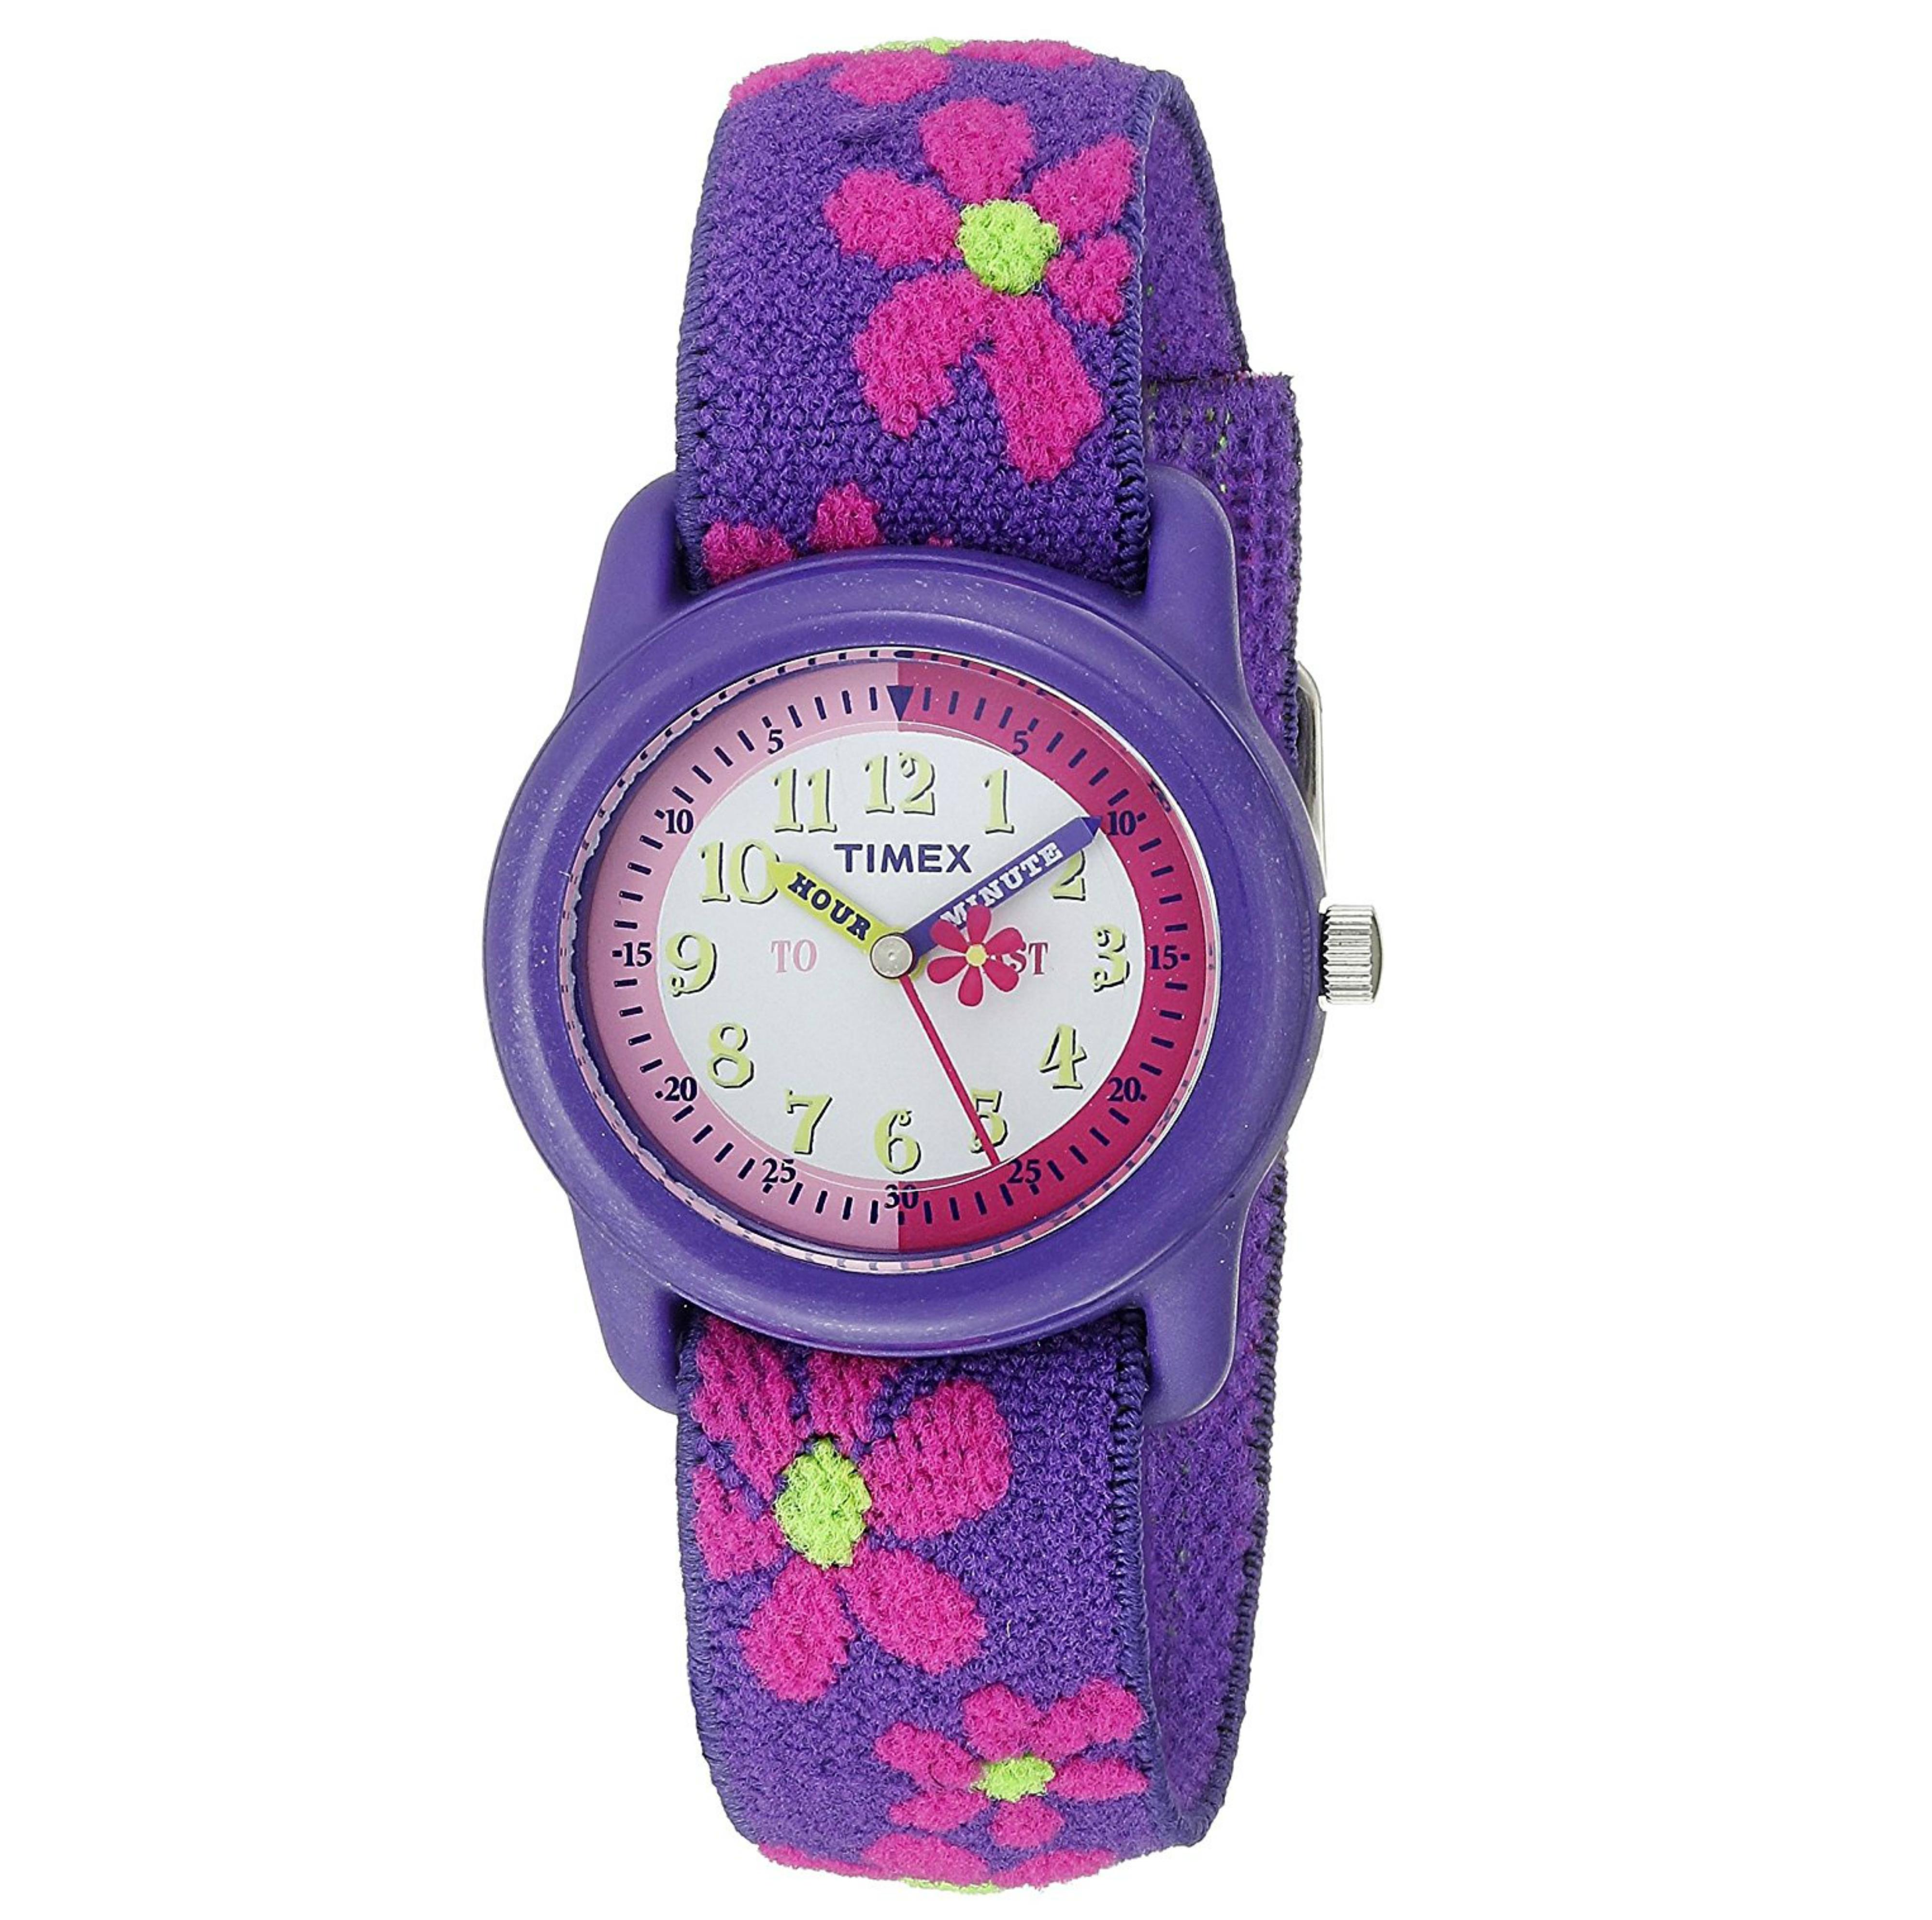 Timex Kidz T89022  Flowers Time Teacher Watch?Flower Strap?Analogue Display?NEW